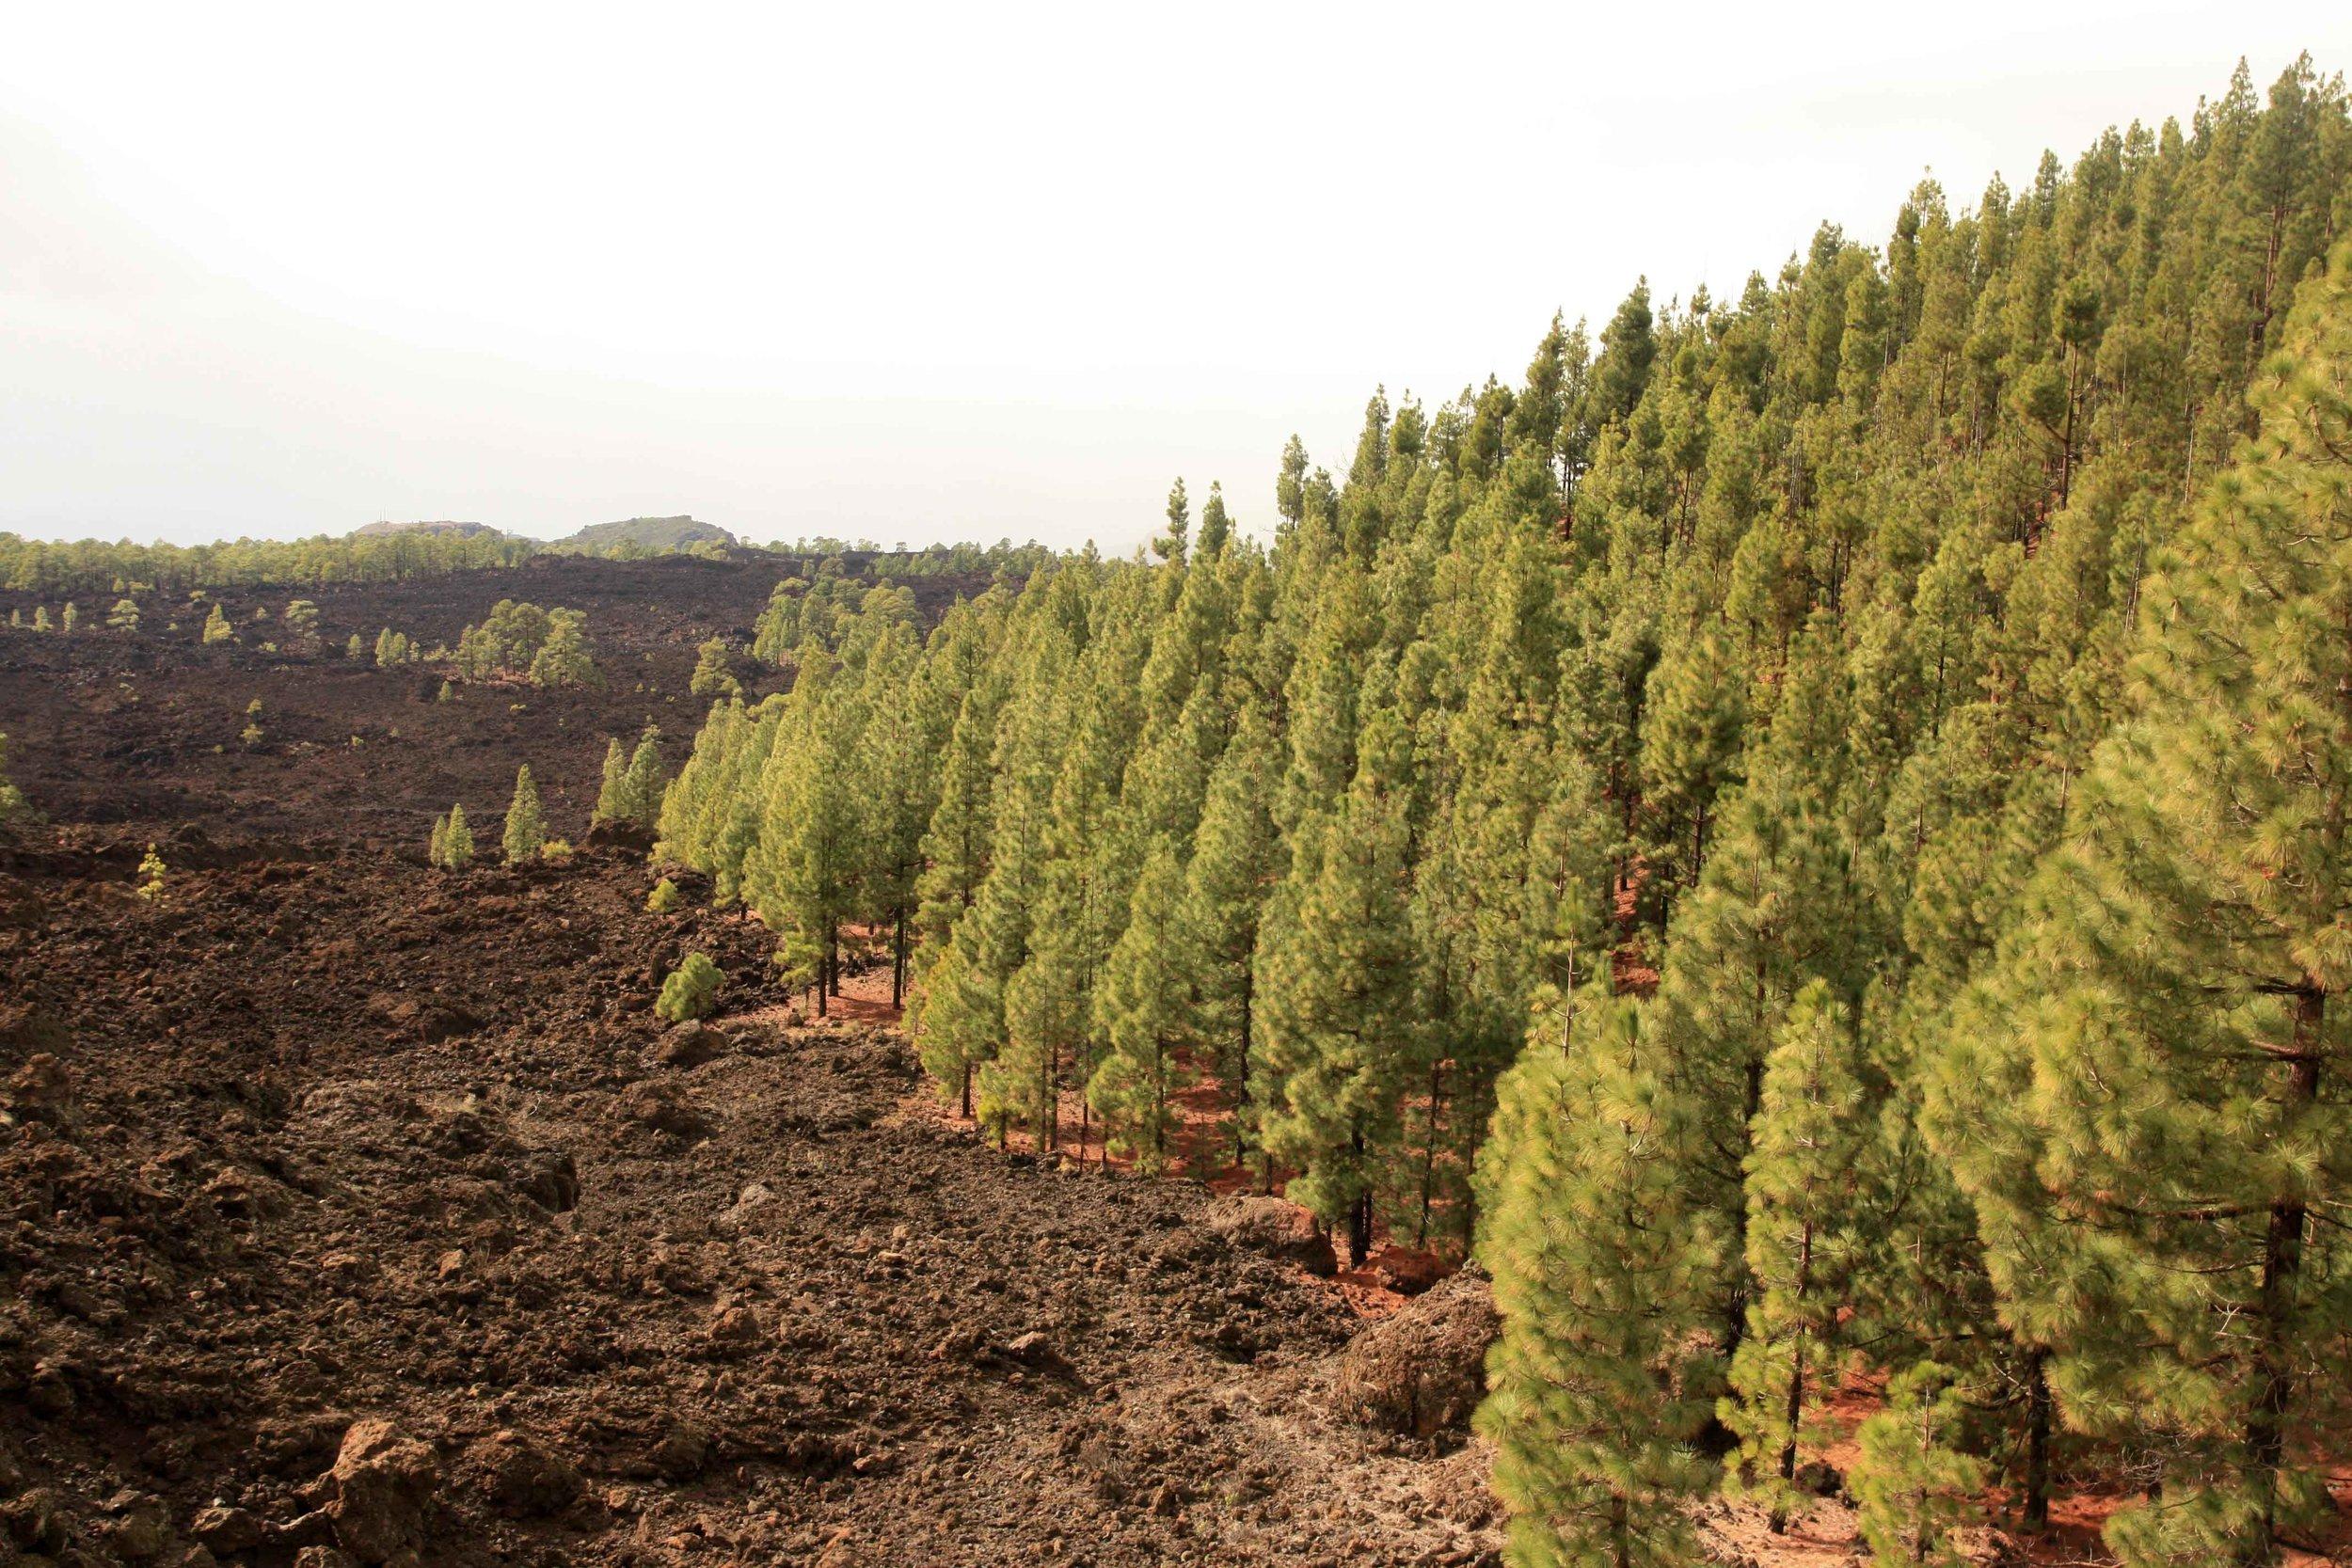 Pinus canariensis  and lava field, approaching the Caldera de las Cañadas.